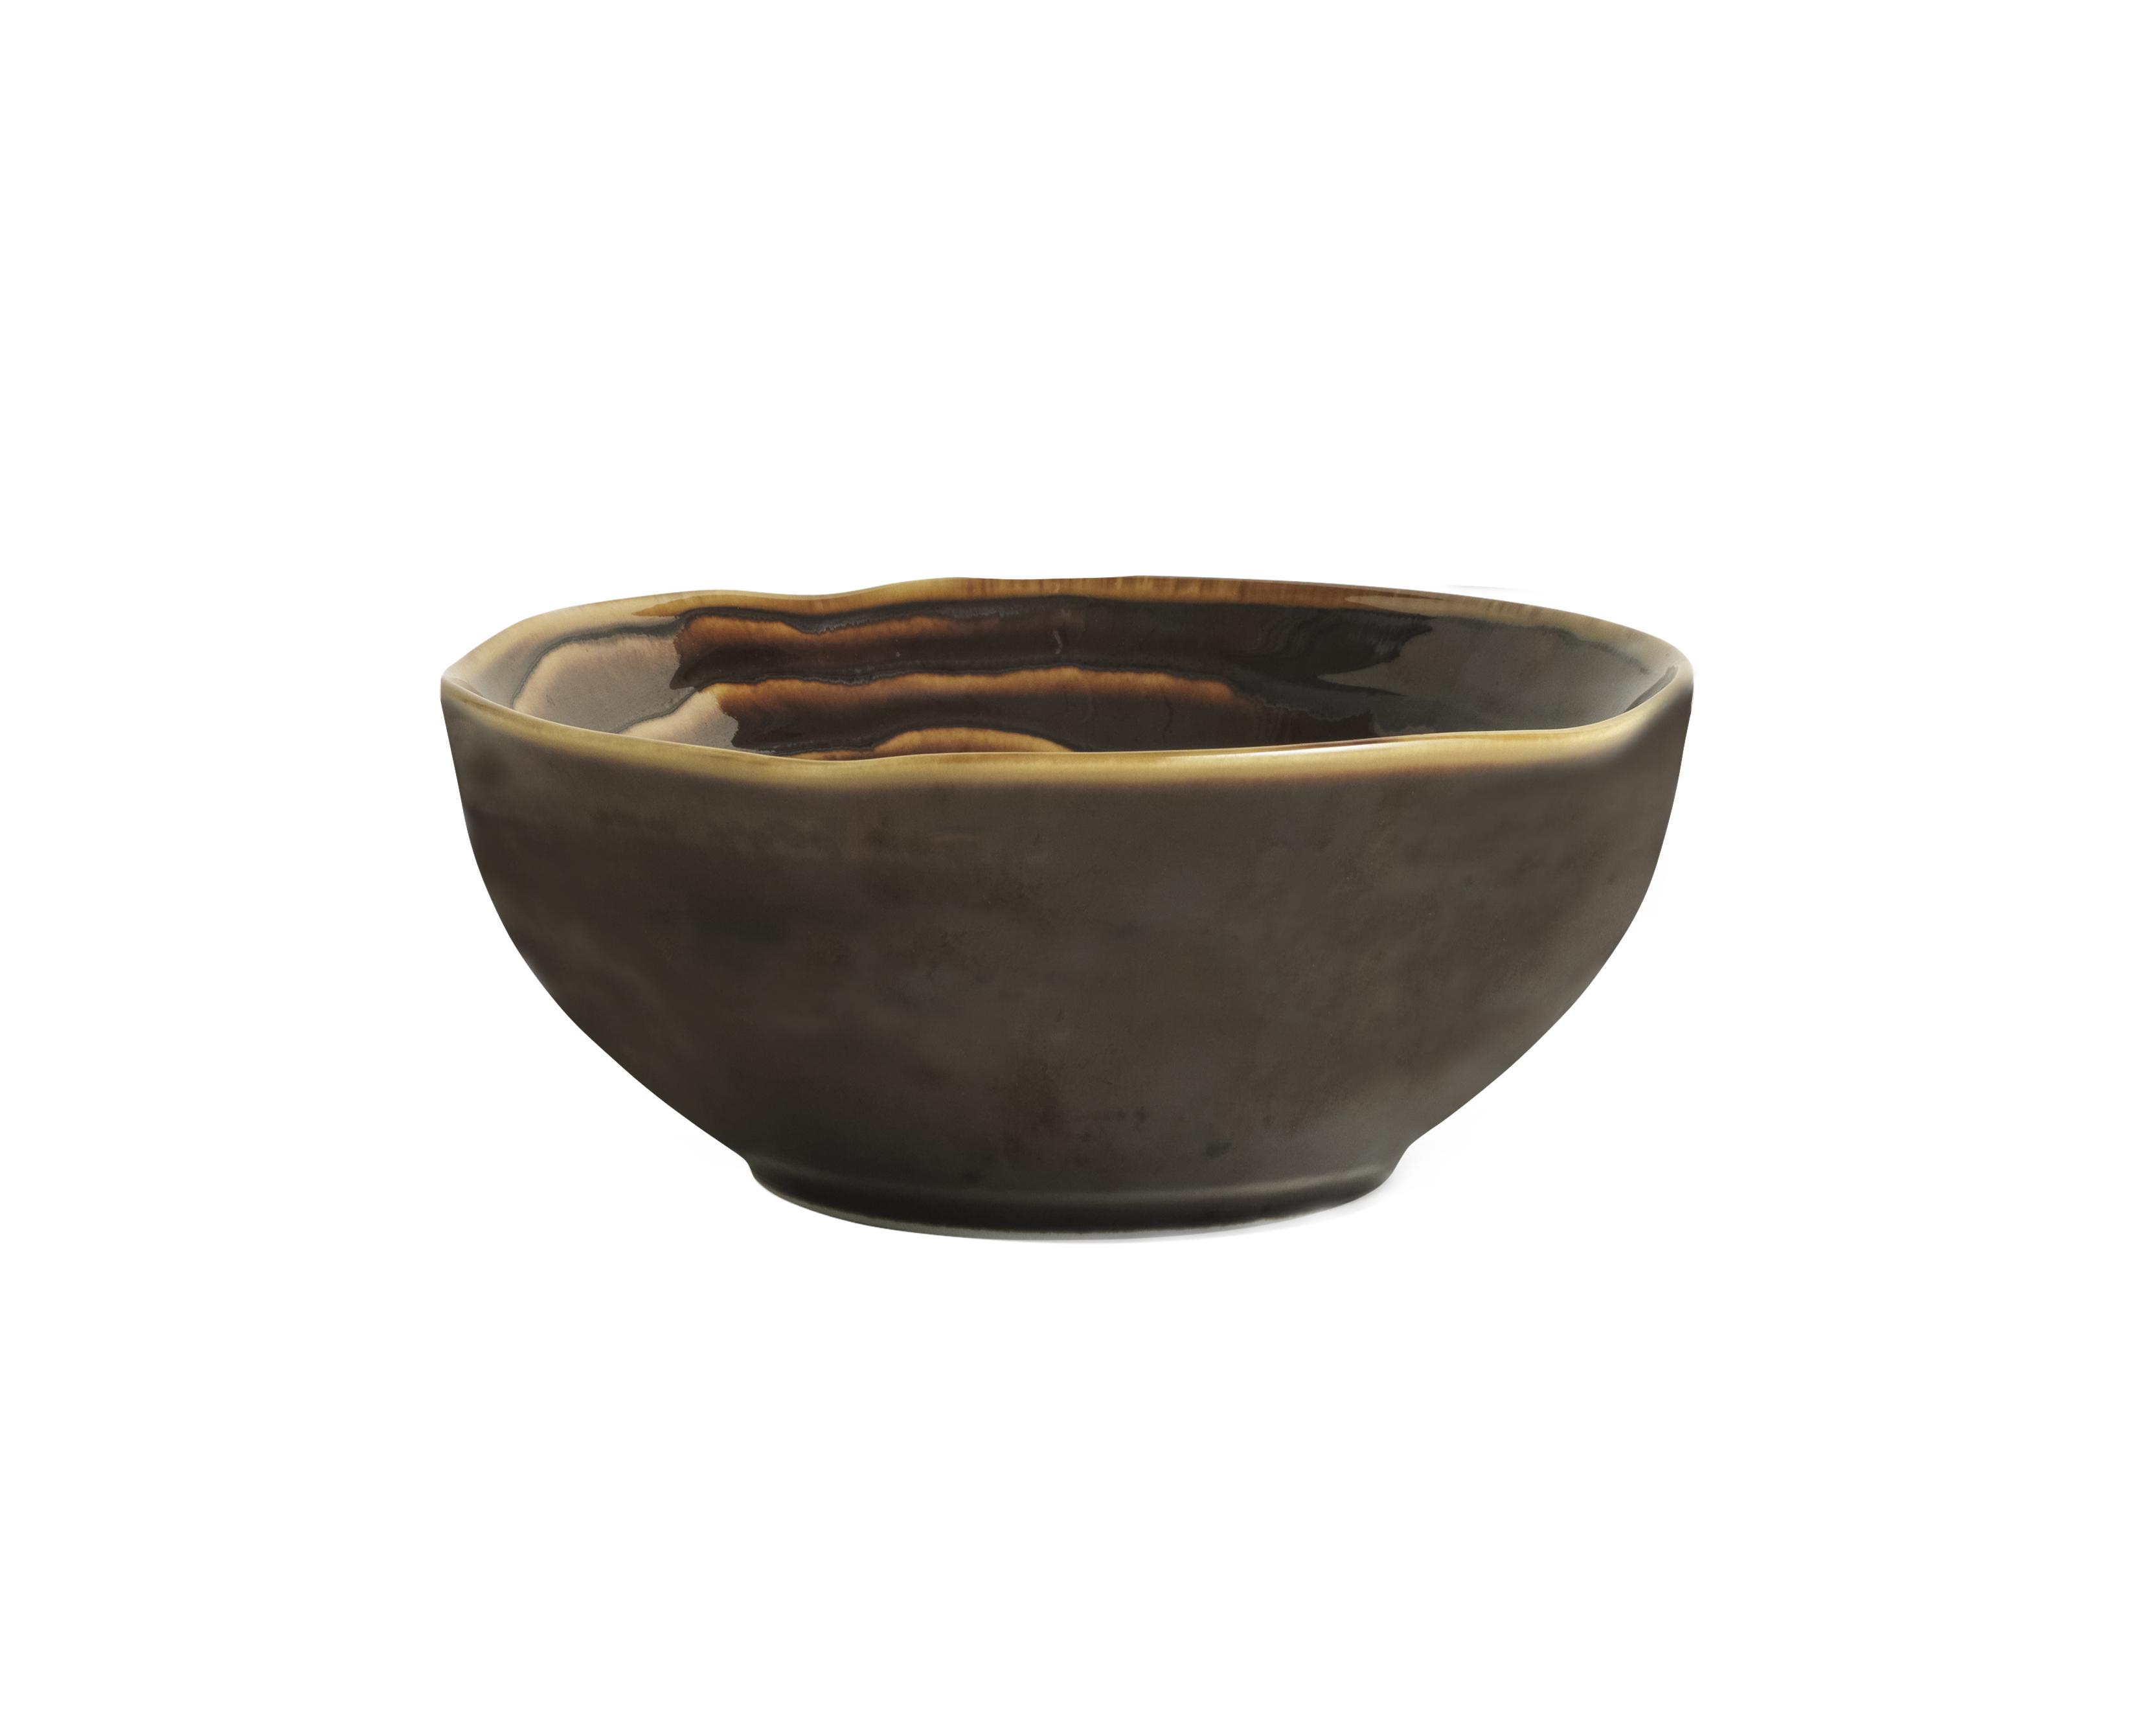 Pillivuyt Boulogne skål, Ø15 cm, brun